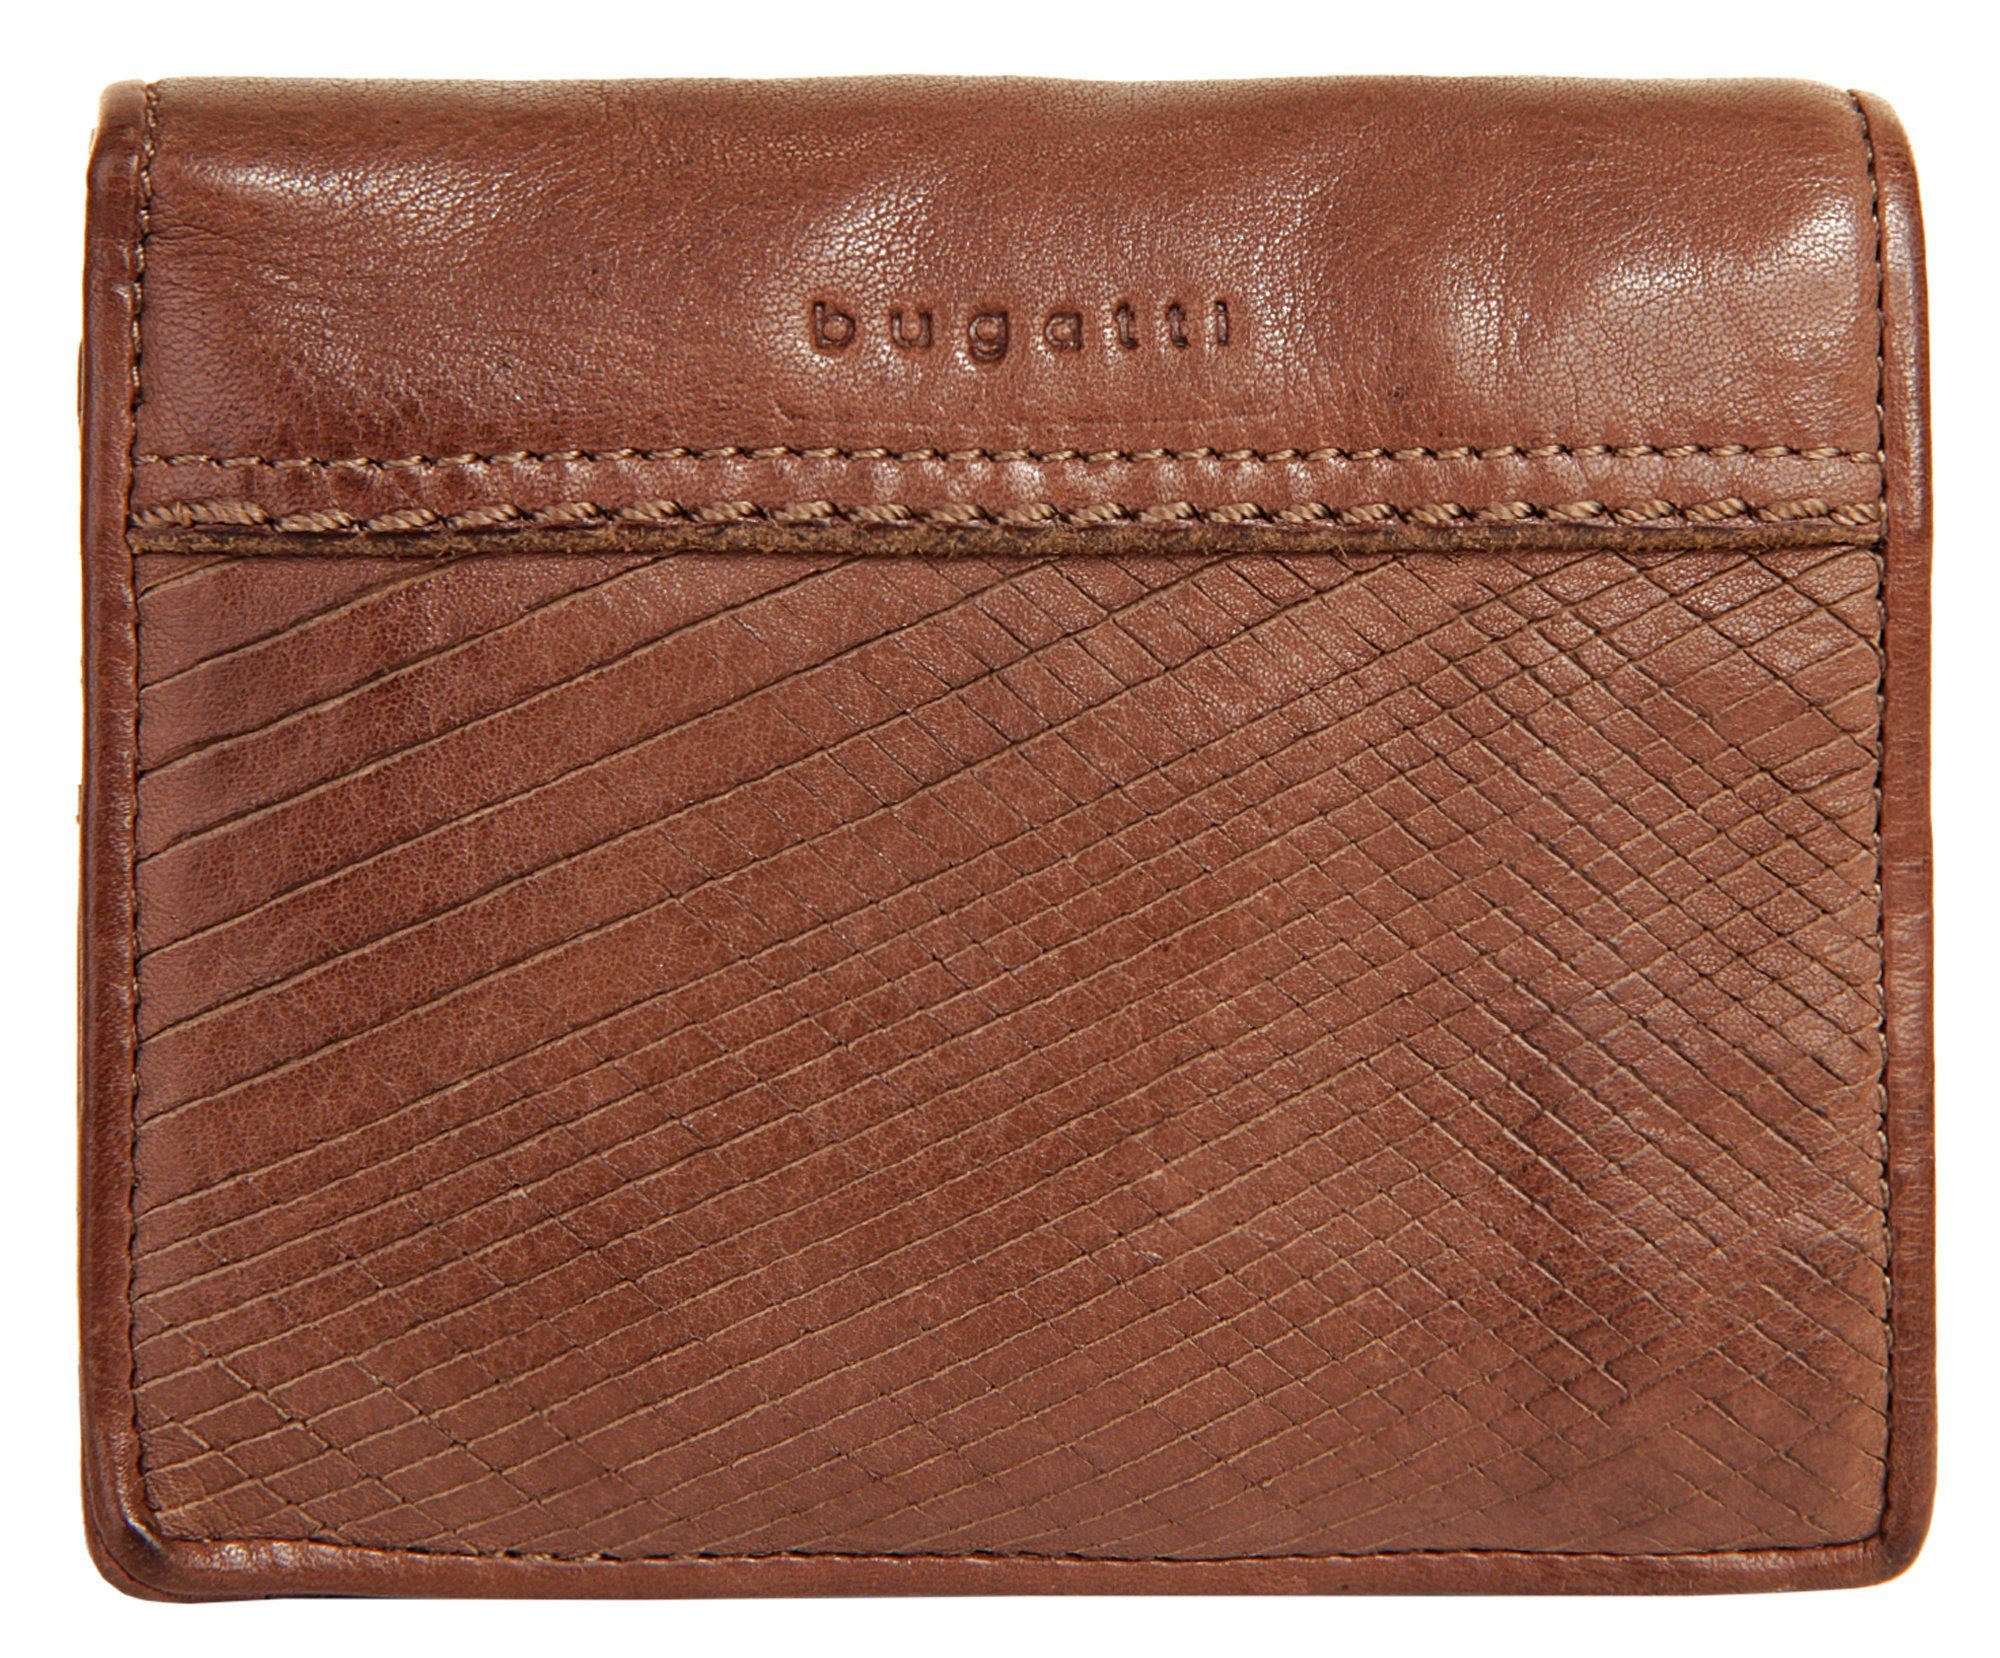 Bugatti Geldbörse »TAGLIATA«, Kreditkartenfächer